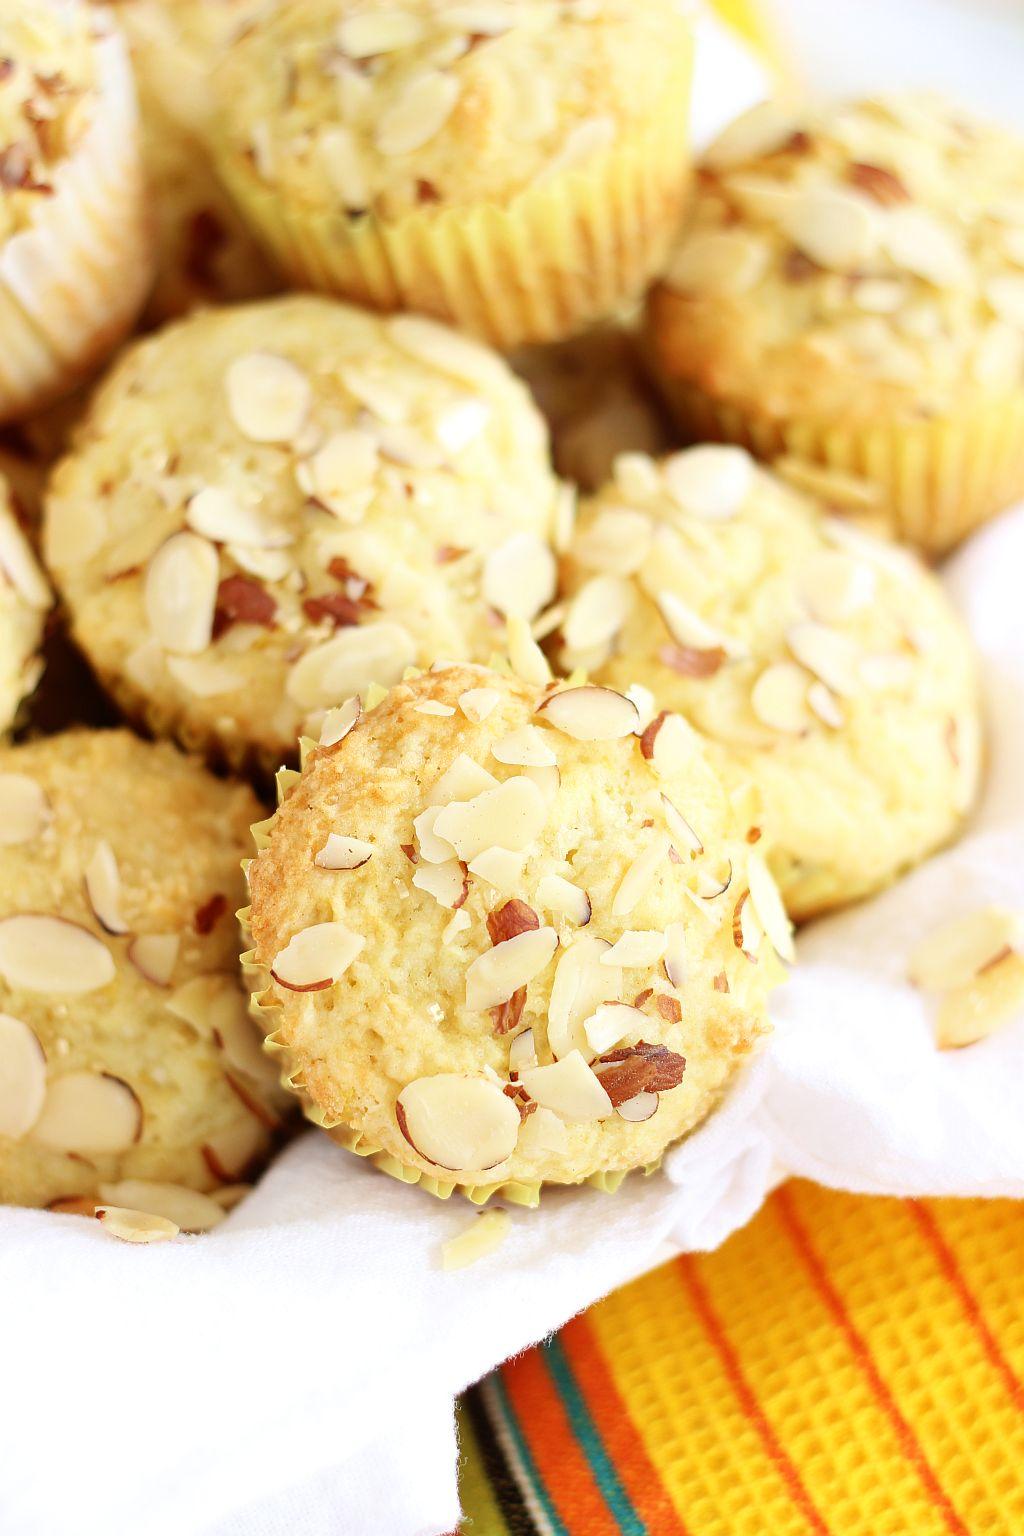 Lemon Almond Ricotta Muffins